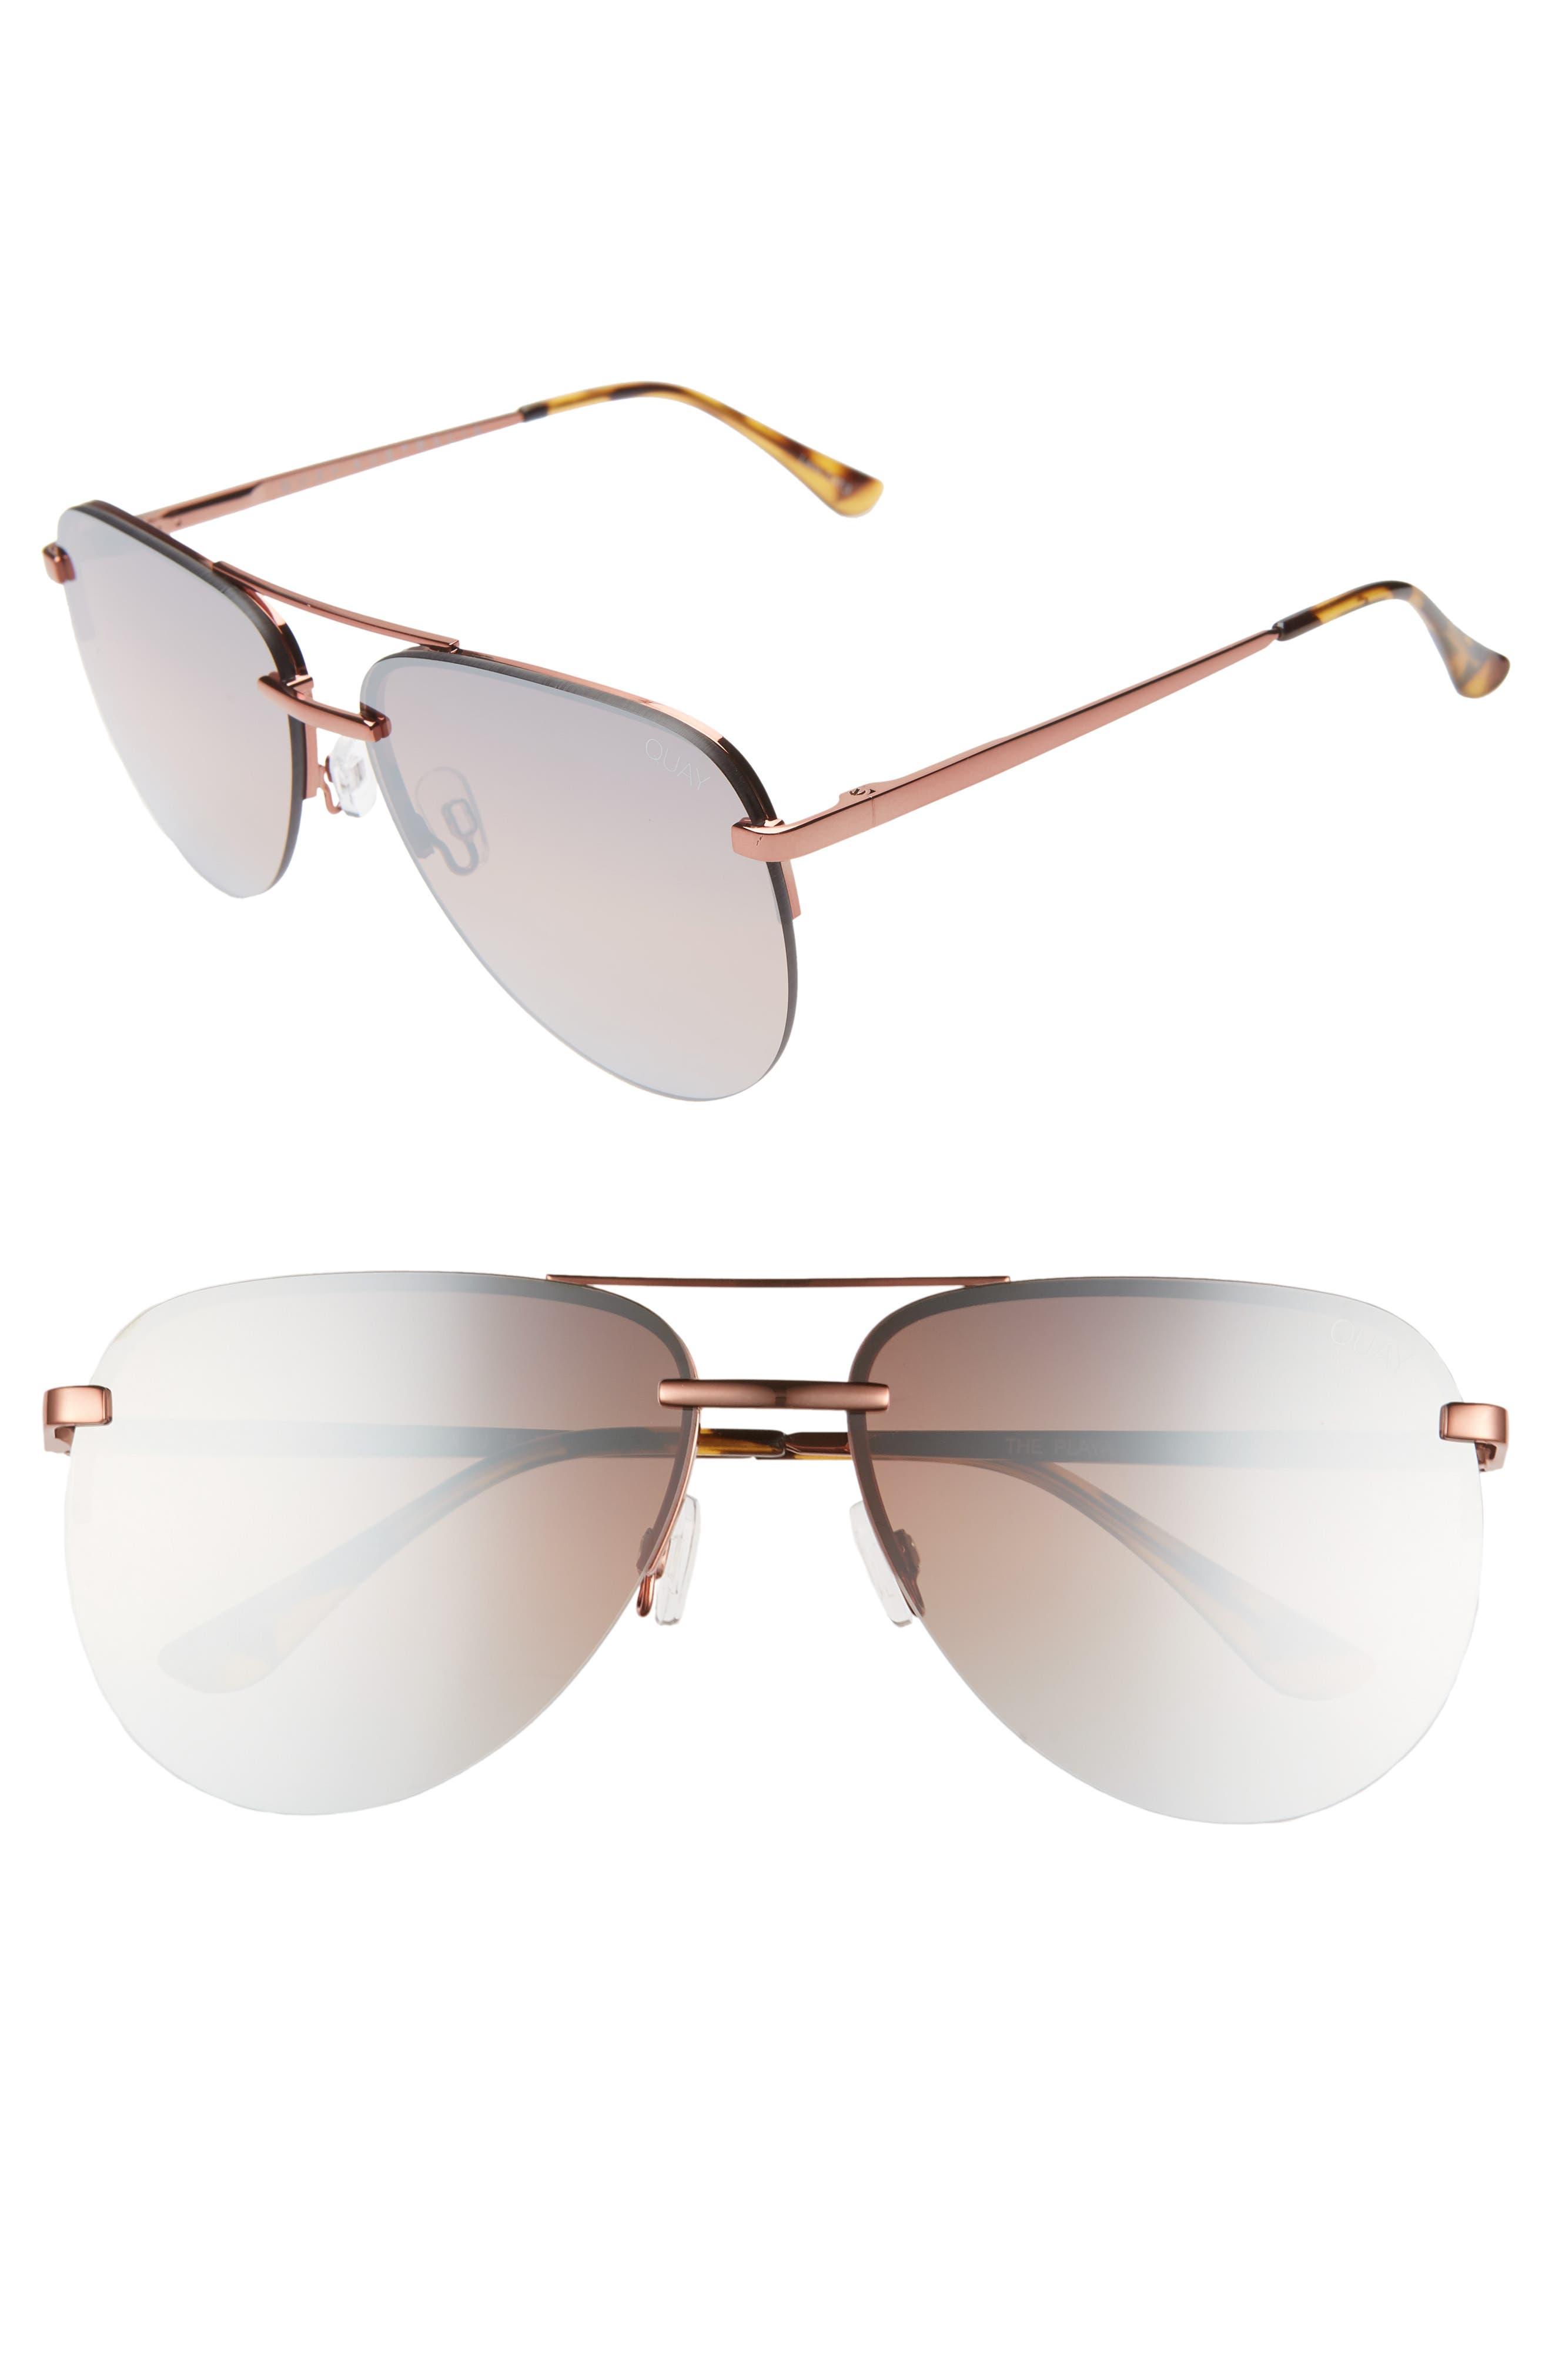 QUAY AUSTRALIA, x JLO The Playa 54mm Aviator Sunglasses, Main thumbnail 1, color, BRONZE/ BROWN